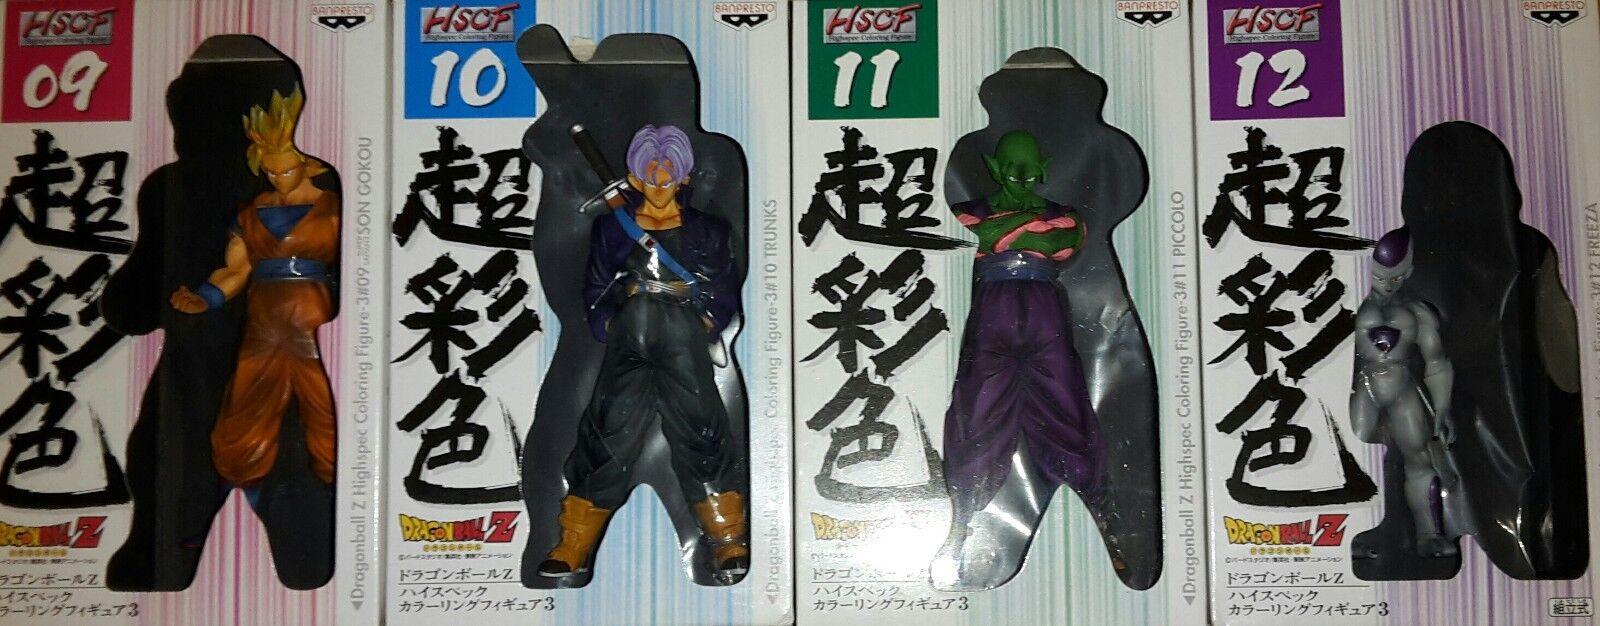 HSCF DragonBall Z Son Goku,Trunks,Piccolo & Freeza Figure Set